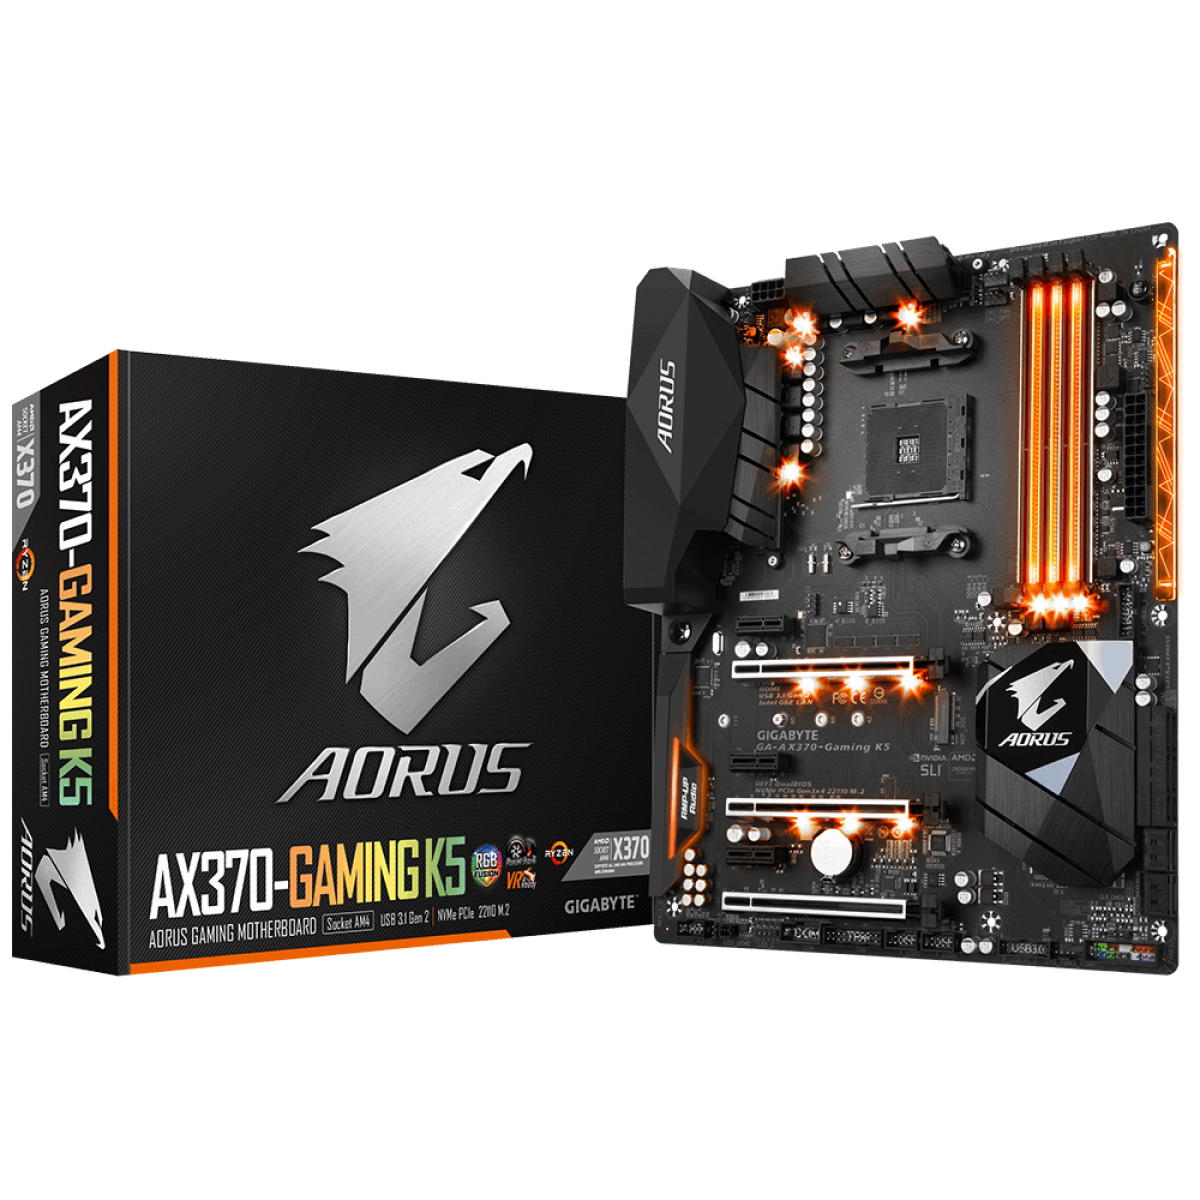 Placa Mãe Gigabyte AORUS GA-AX370-Gaming K5, Chipset X370, AMD AM4, ATX, DDR4